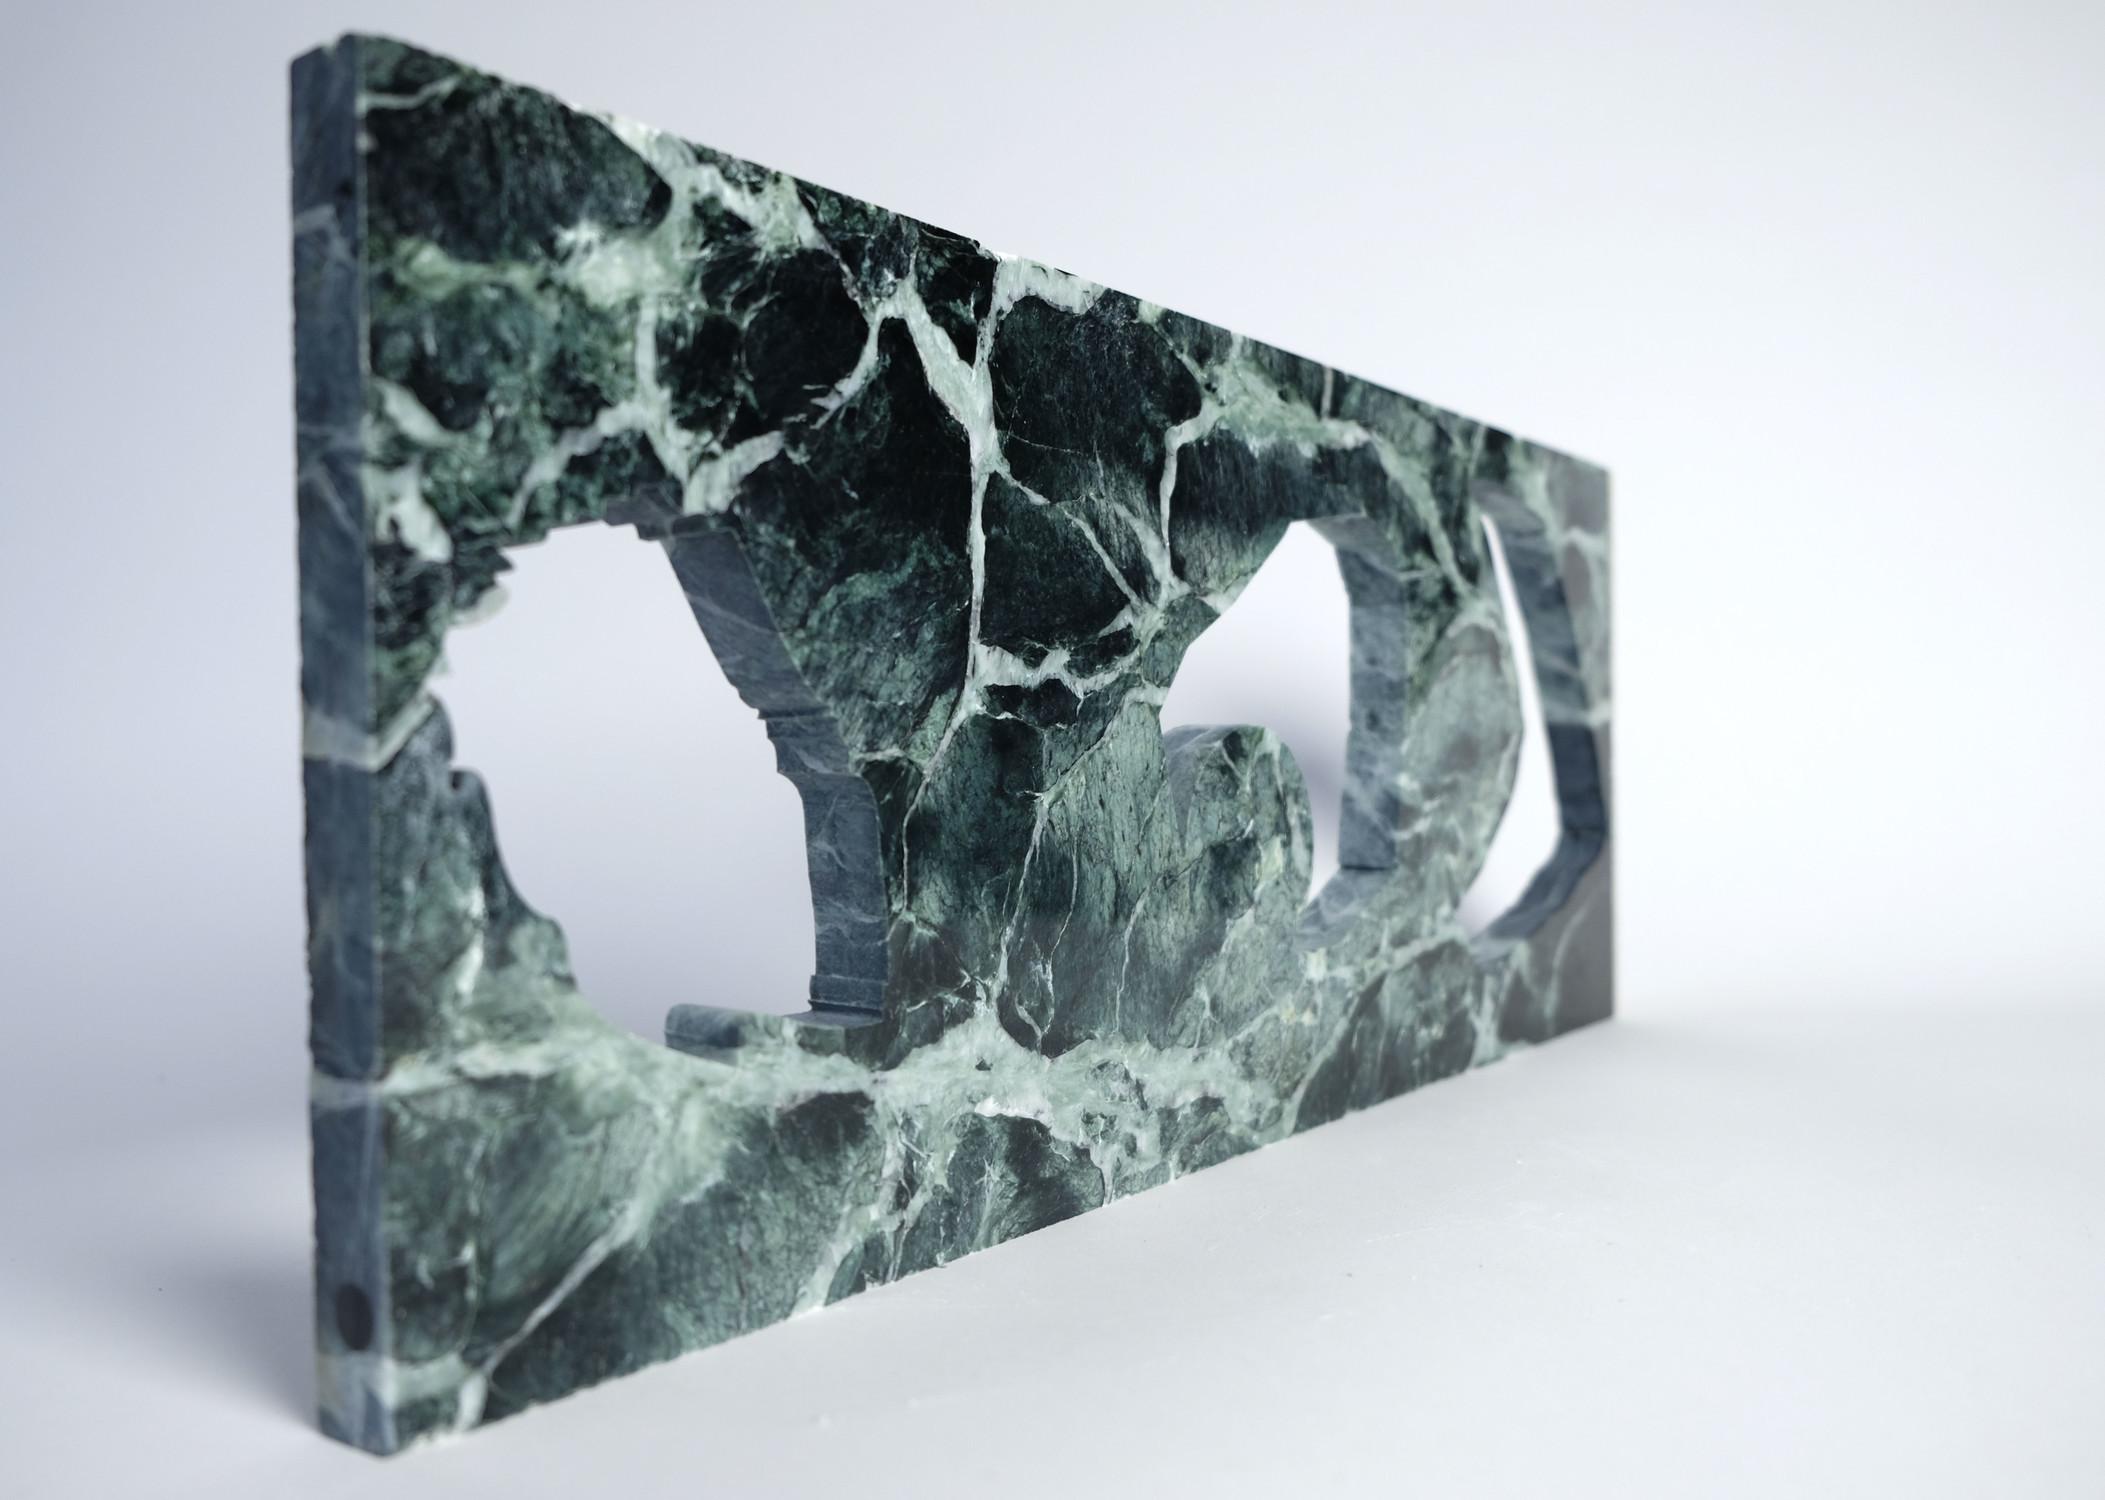 Stone Edge - © Bigtime.